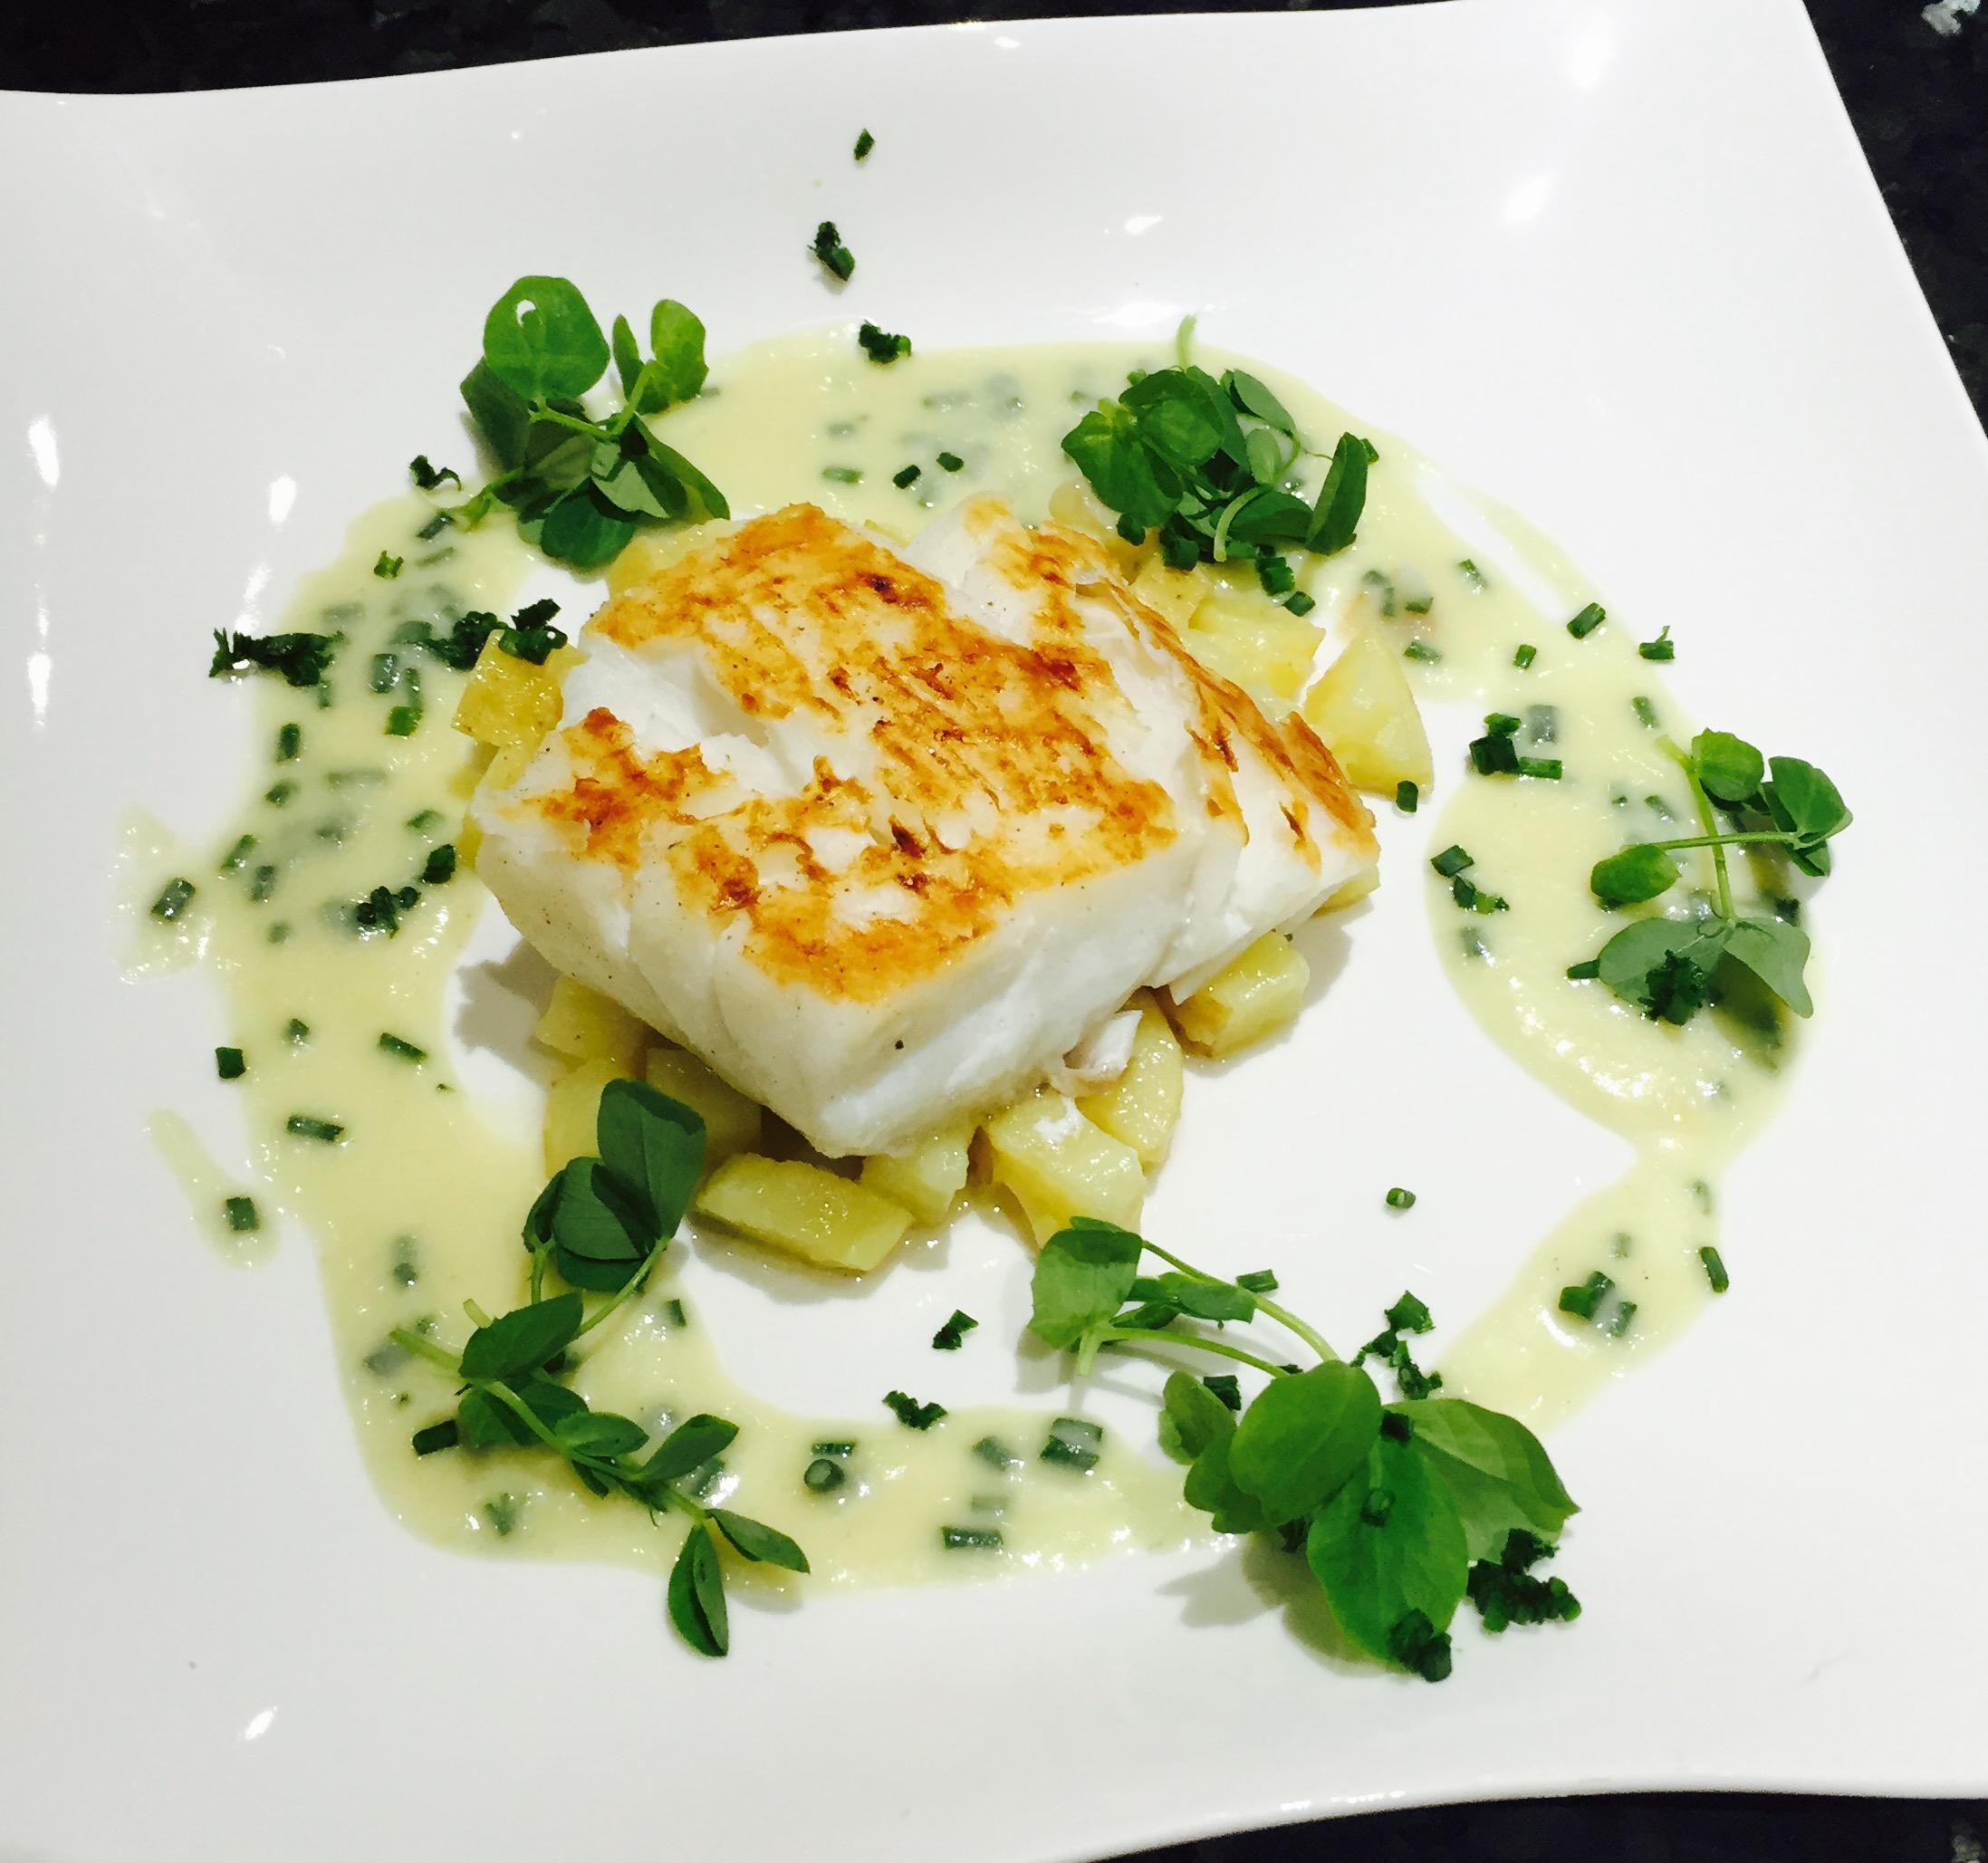 hestons pan seared cod with leek and potato sauce